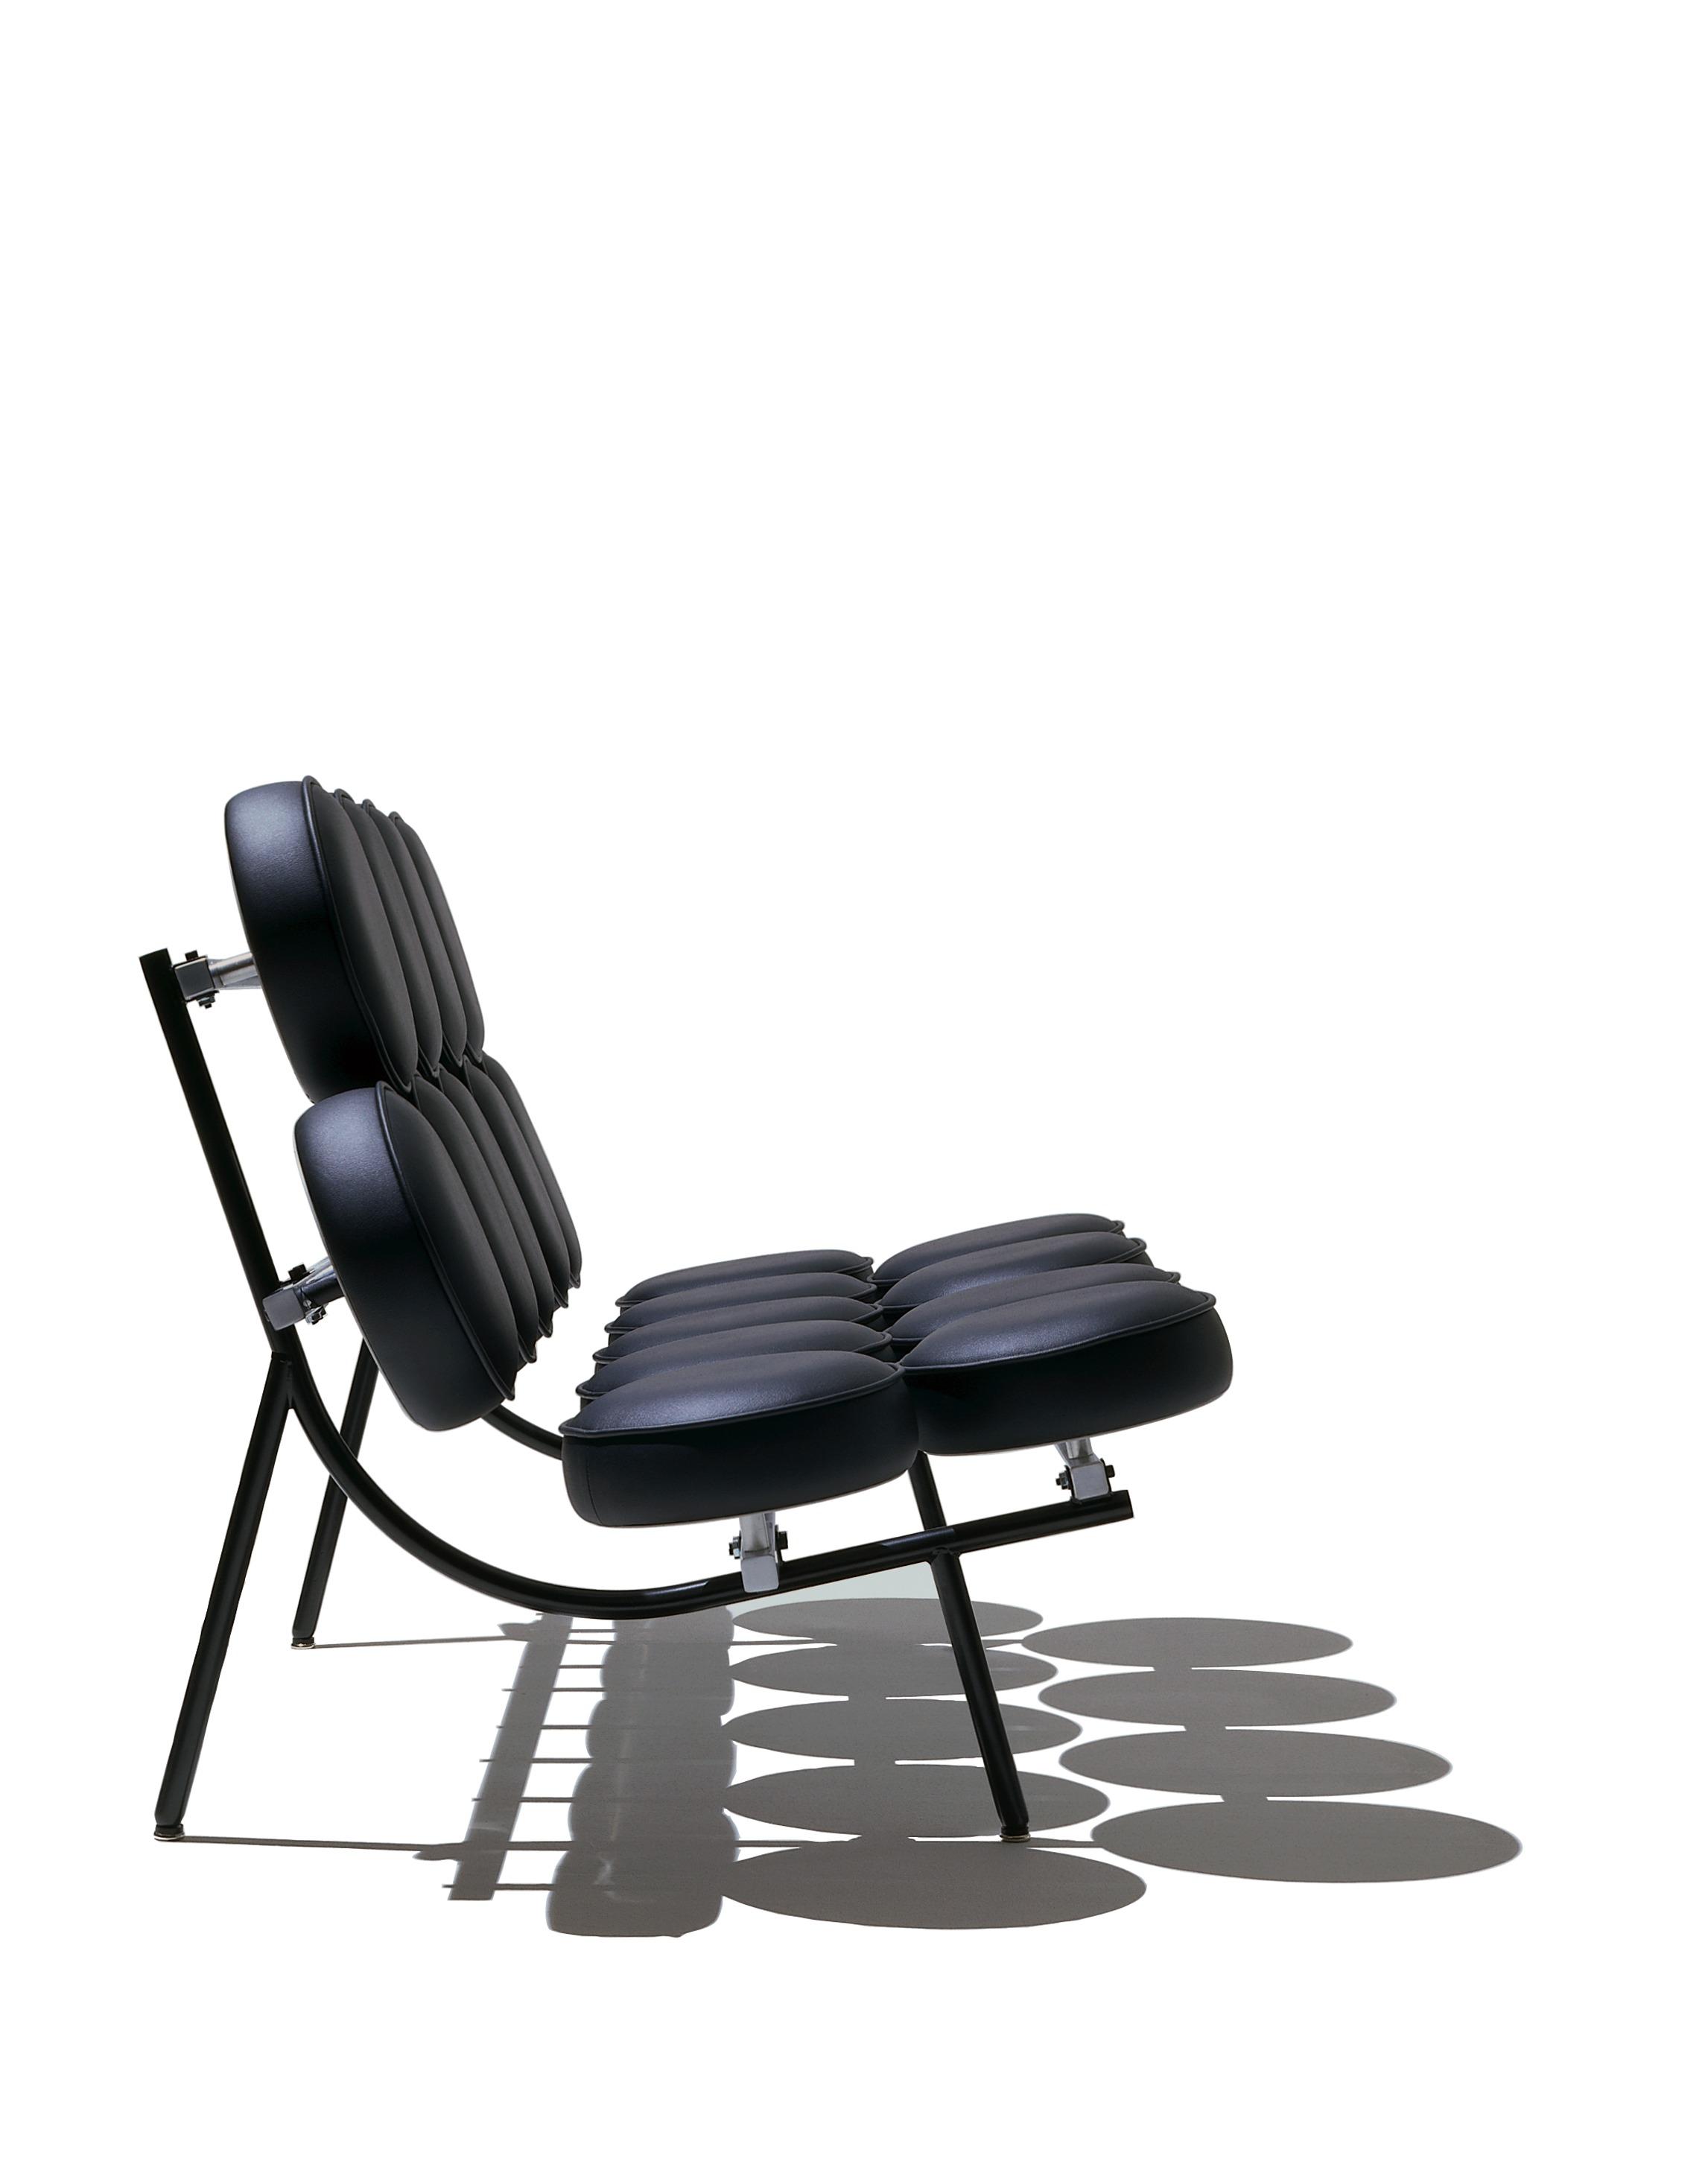 Lounge Seating ficio Mondo